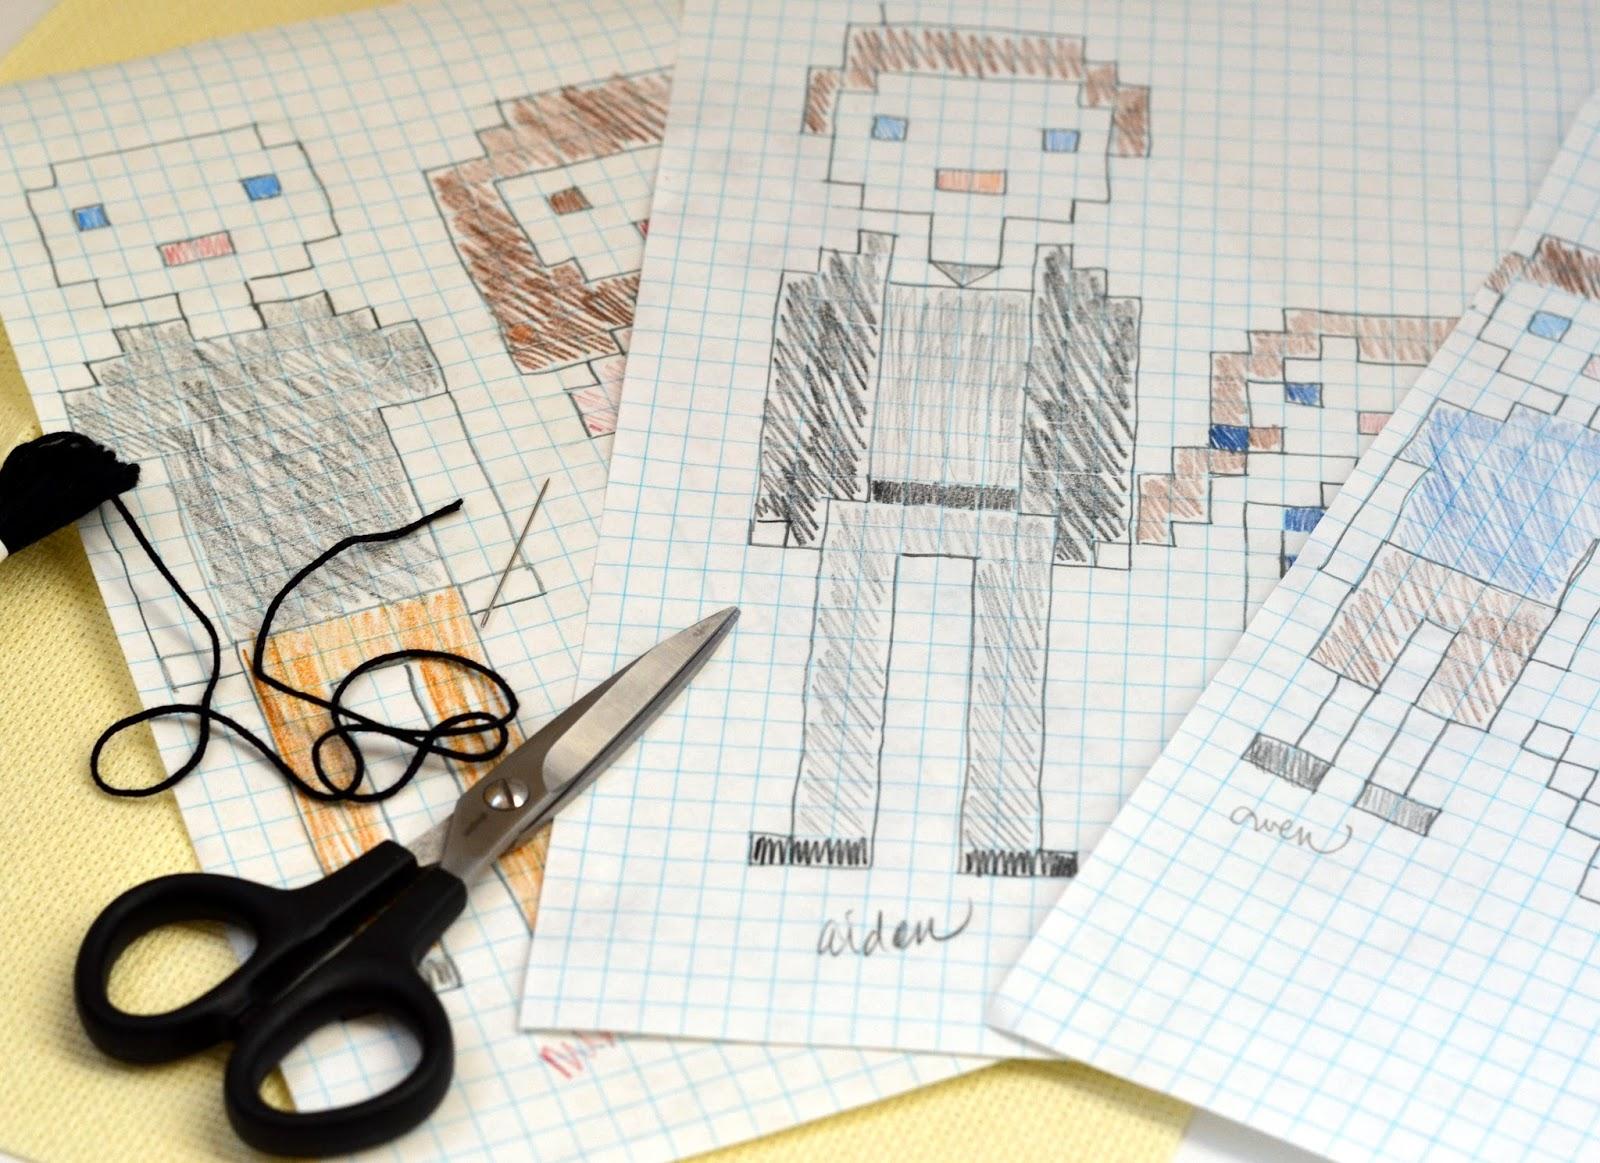 Cross stitch family portrait rachel teodoro using graph paper to create cross stitch pattern solutioingenieria Gallery